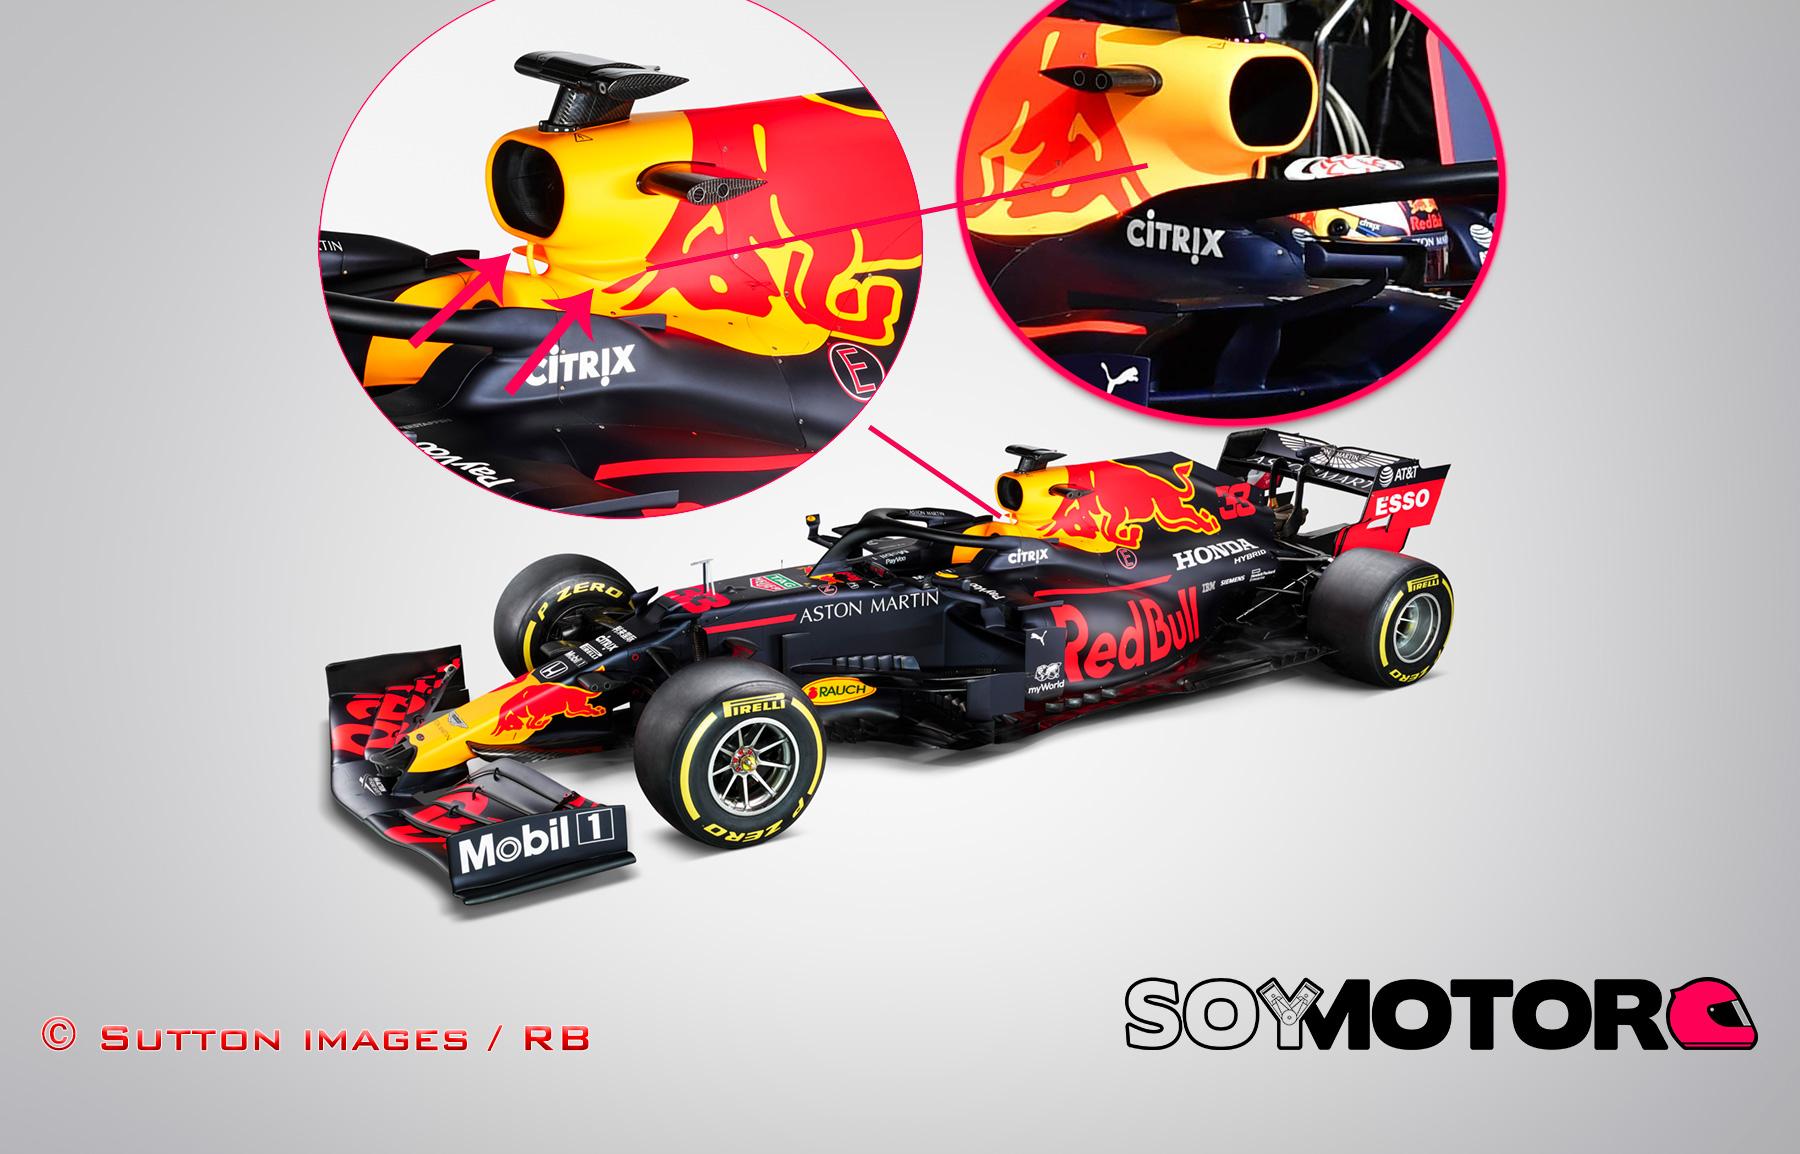 red-bull-airbox-soymotor.jpg